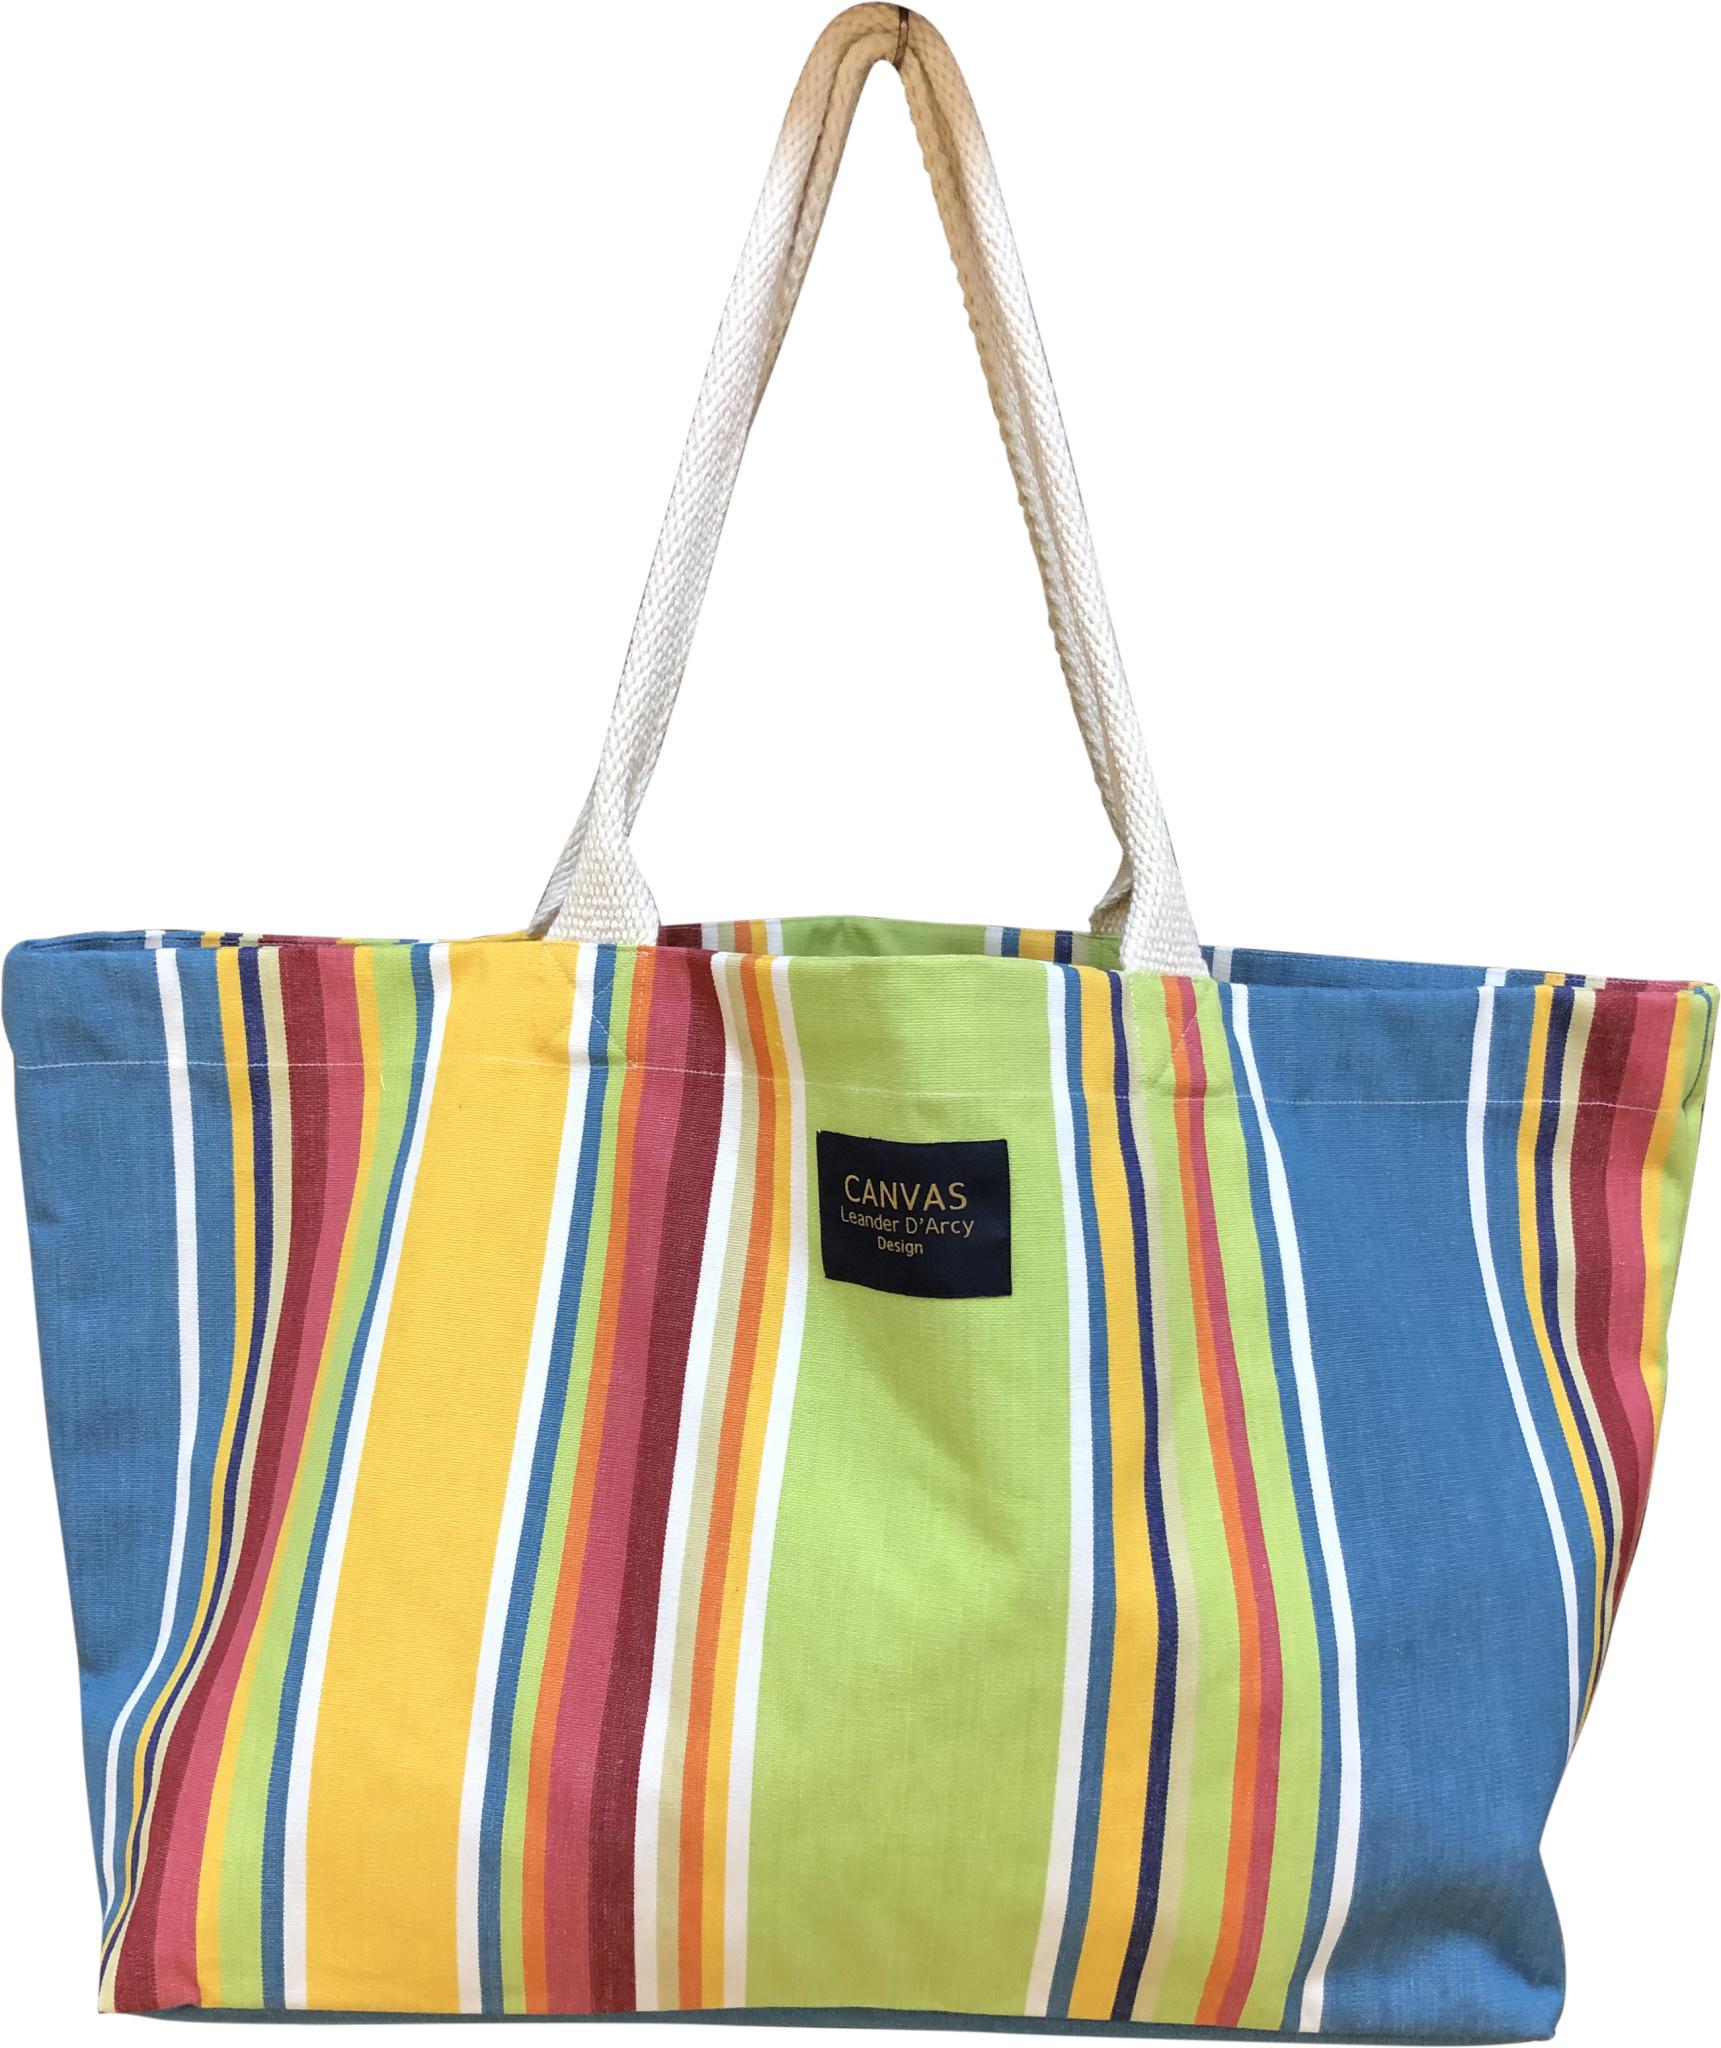 Large Tote Bag Smoothie